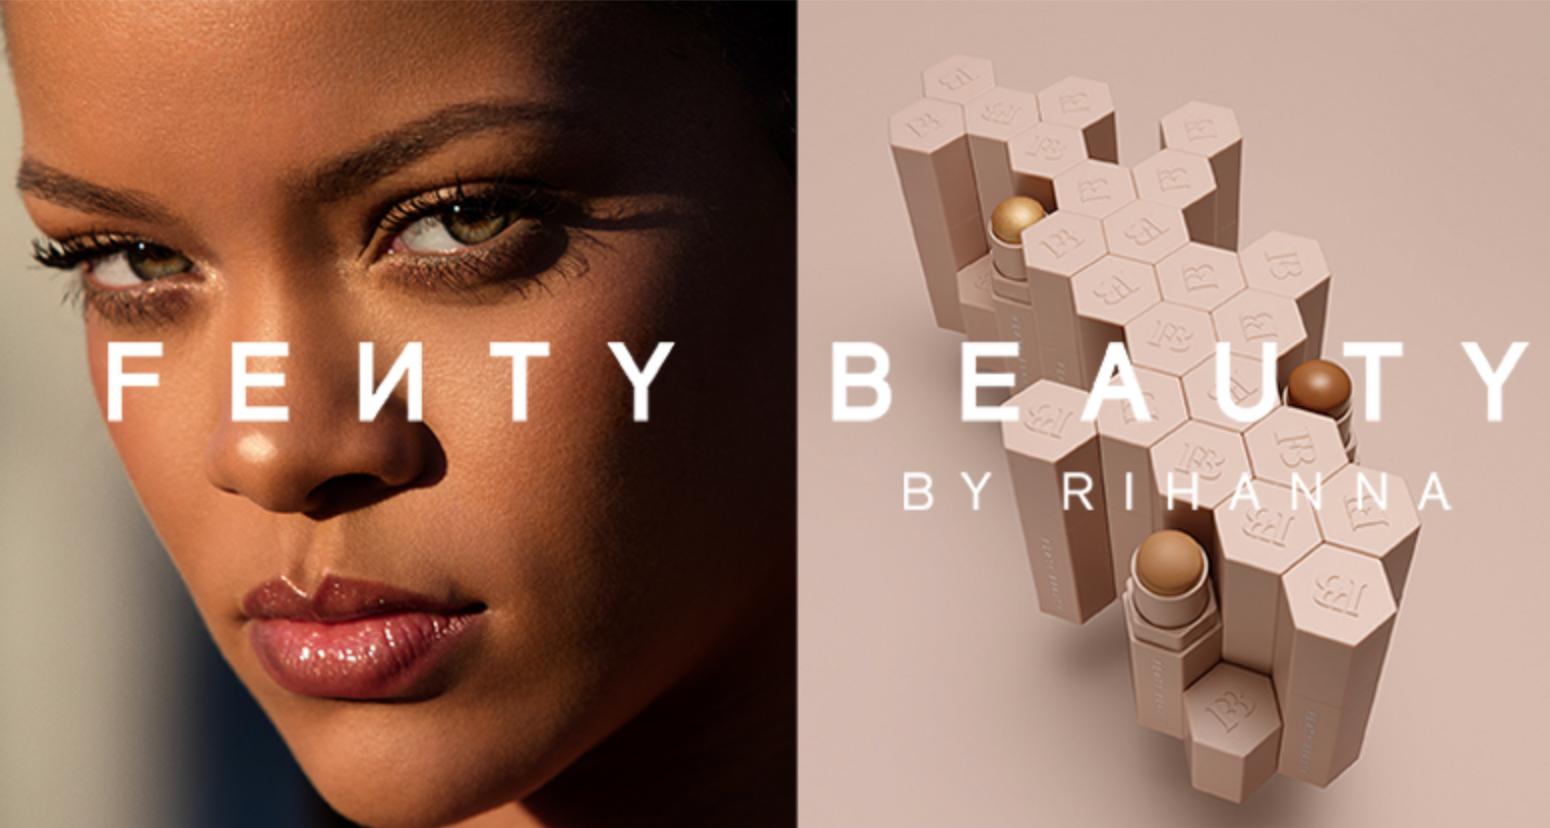 Productos de maquillaje, Fenty Beauty de Rihanna